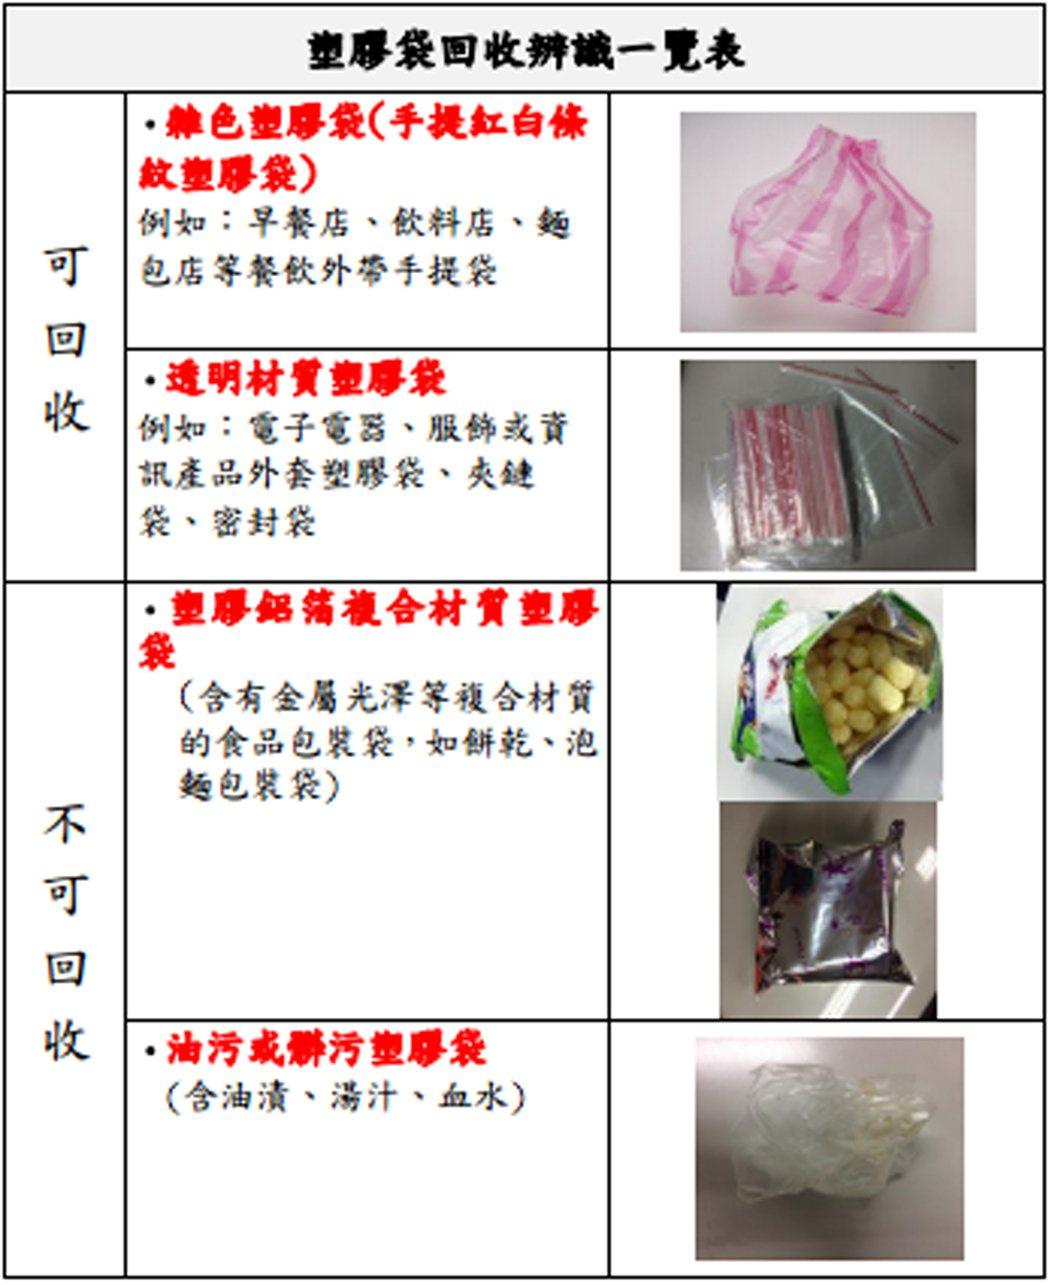 LG台北市公布正確回收塑膠袋方式台北市環保局25日指出,只有「乾...